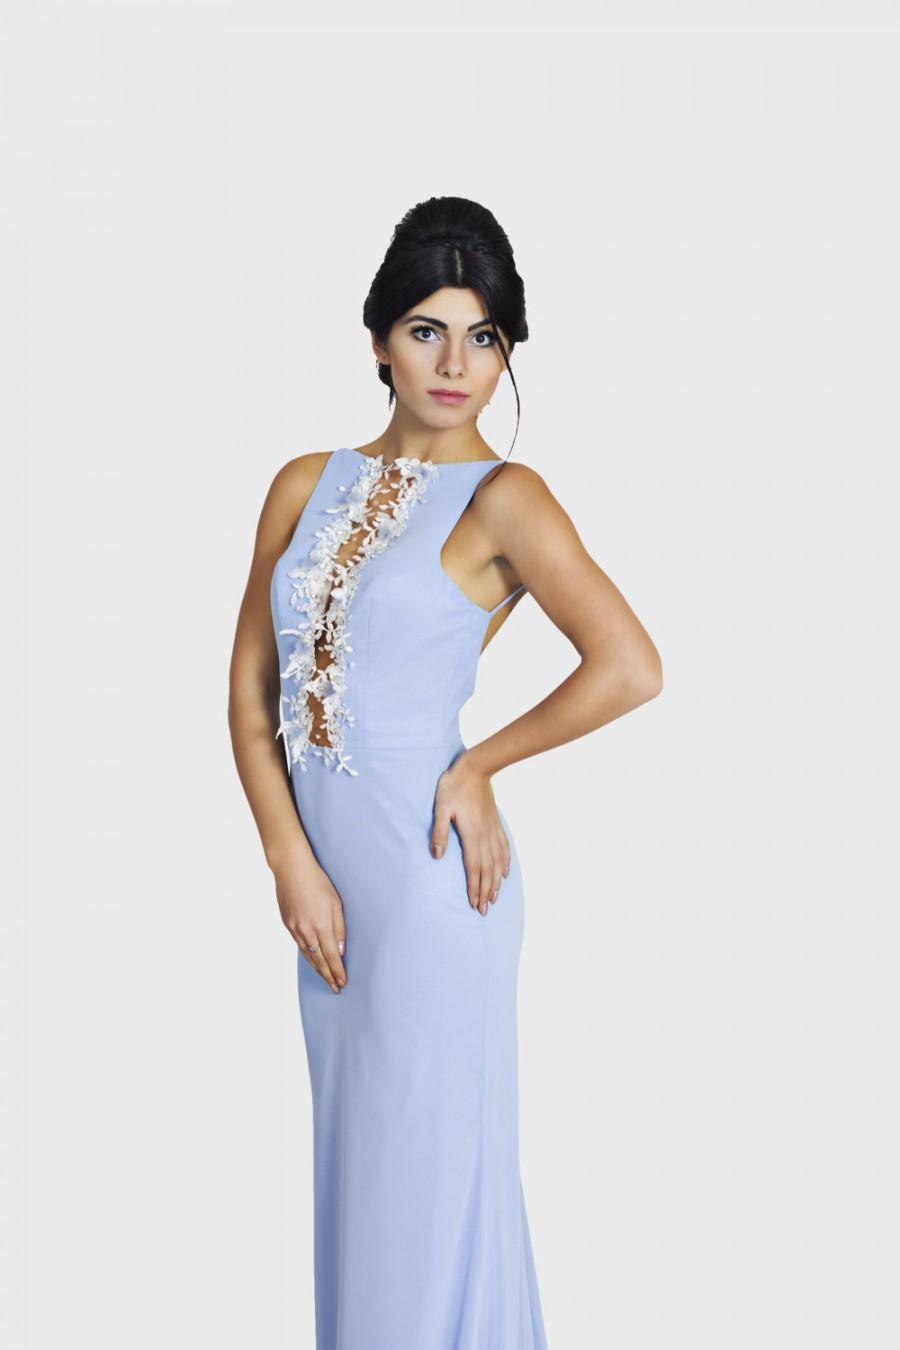 Mariage - Classy sky blue elegant dress / Formal dress, Cocktail dress, Designer dress, Long dress Bridesmaid dress Couture dress Ball gown Prom dress